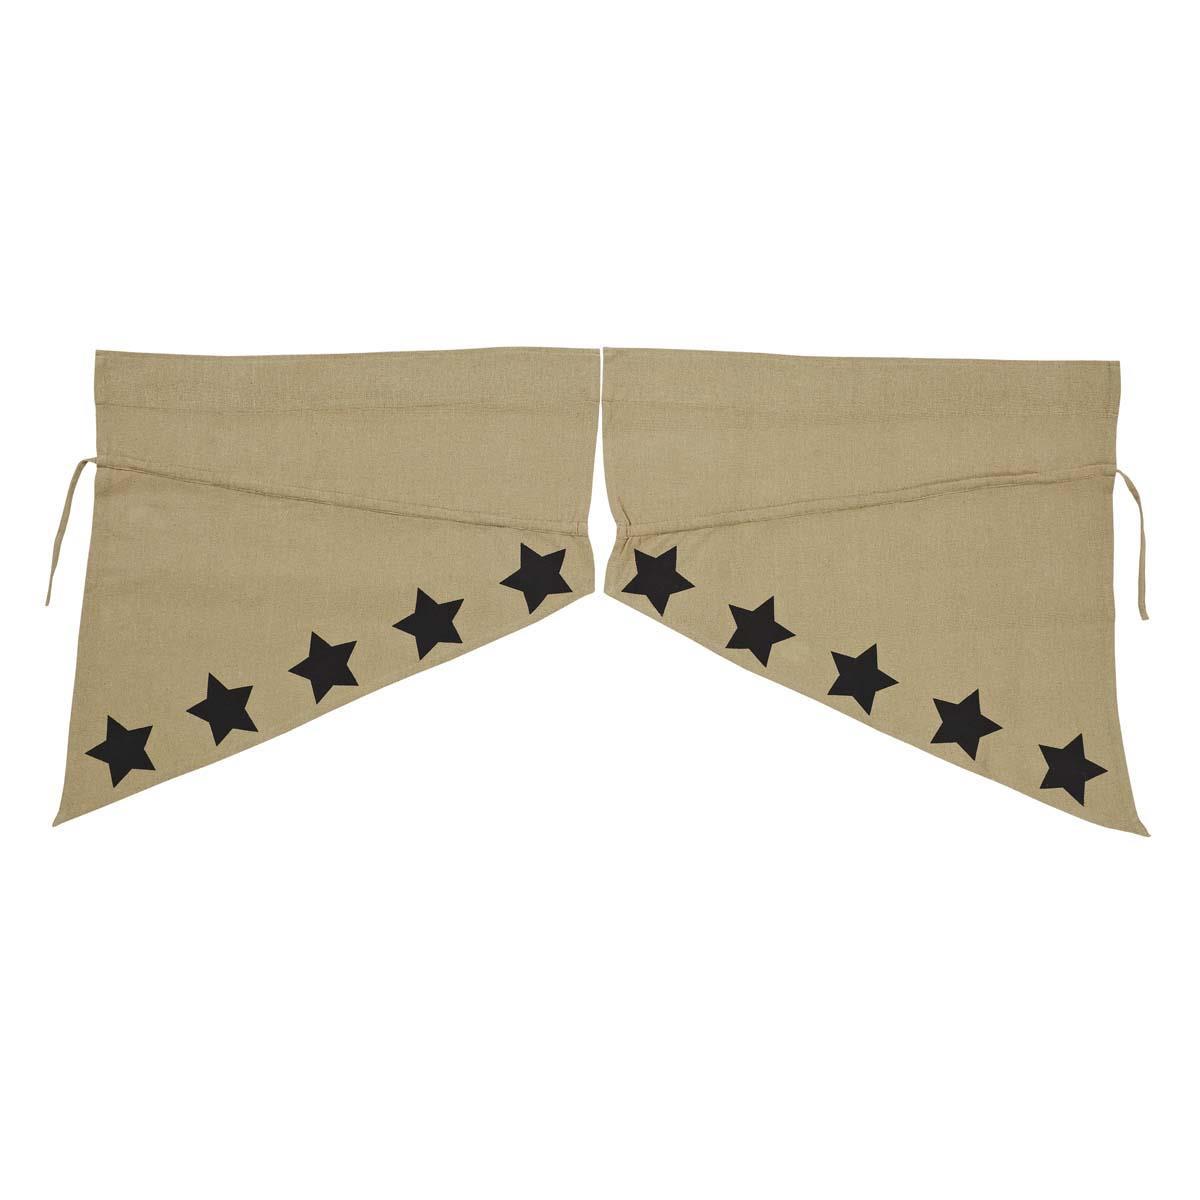 Burlap w/ Stencil Stars Prairie Swag Set - 840528125720